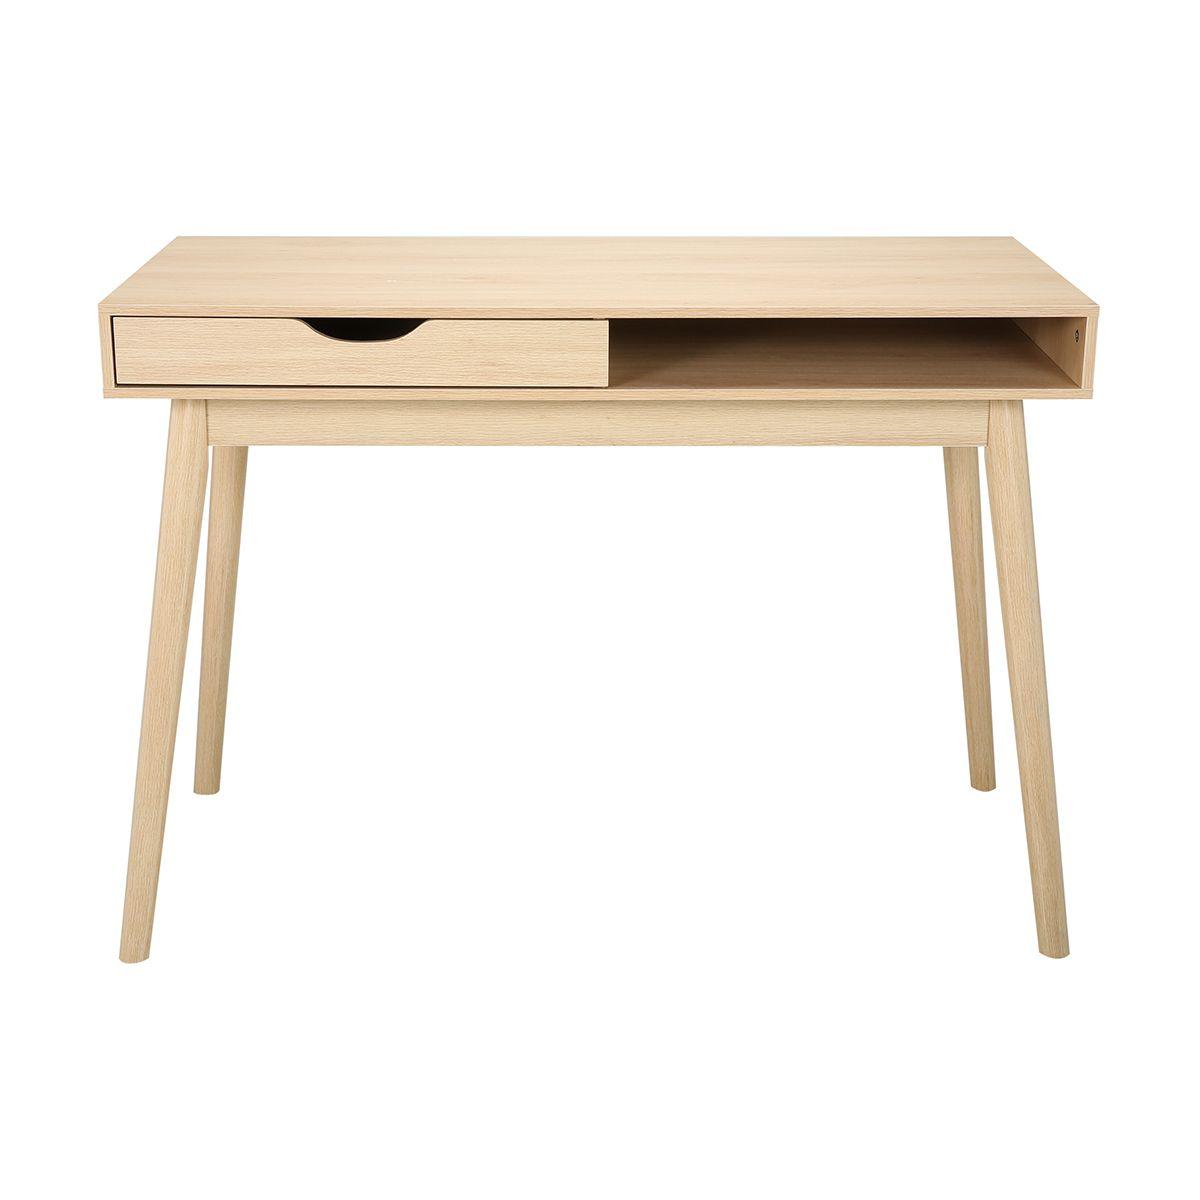 Oak Look Single Drawer Desk Kmart Desk With Drawers Furniture Oak Desk